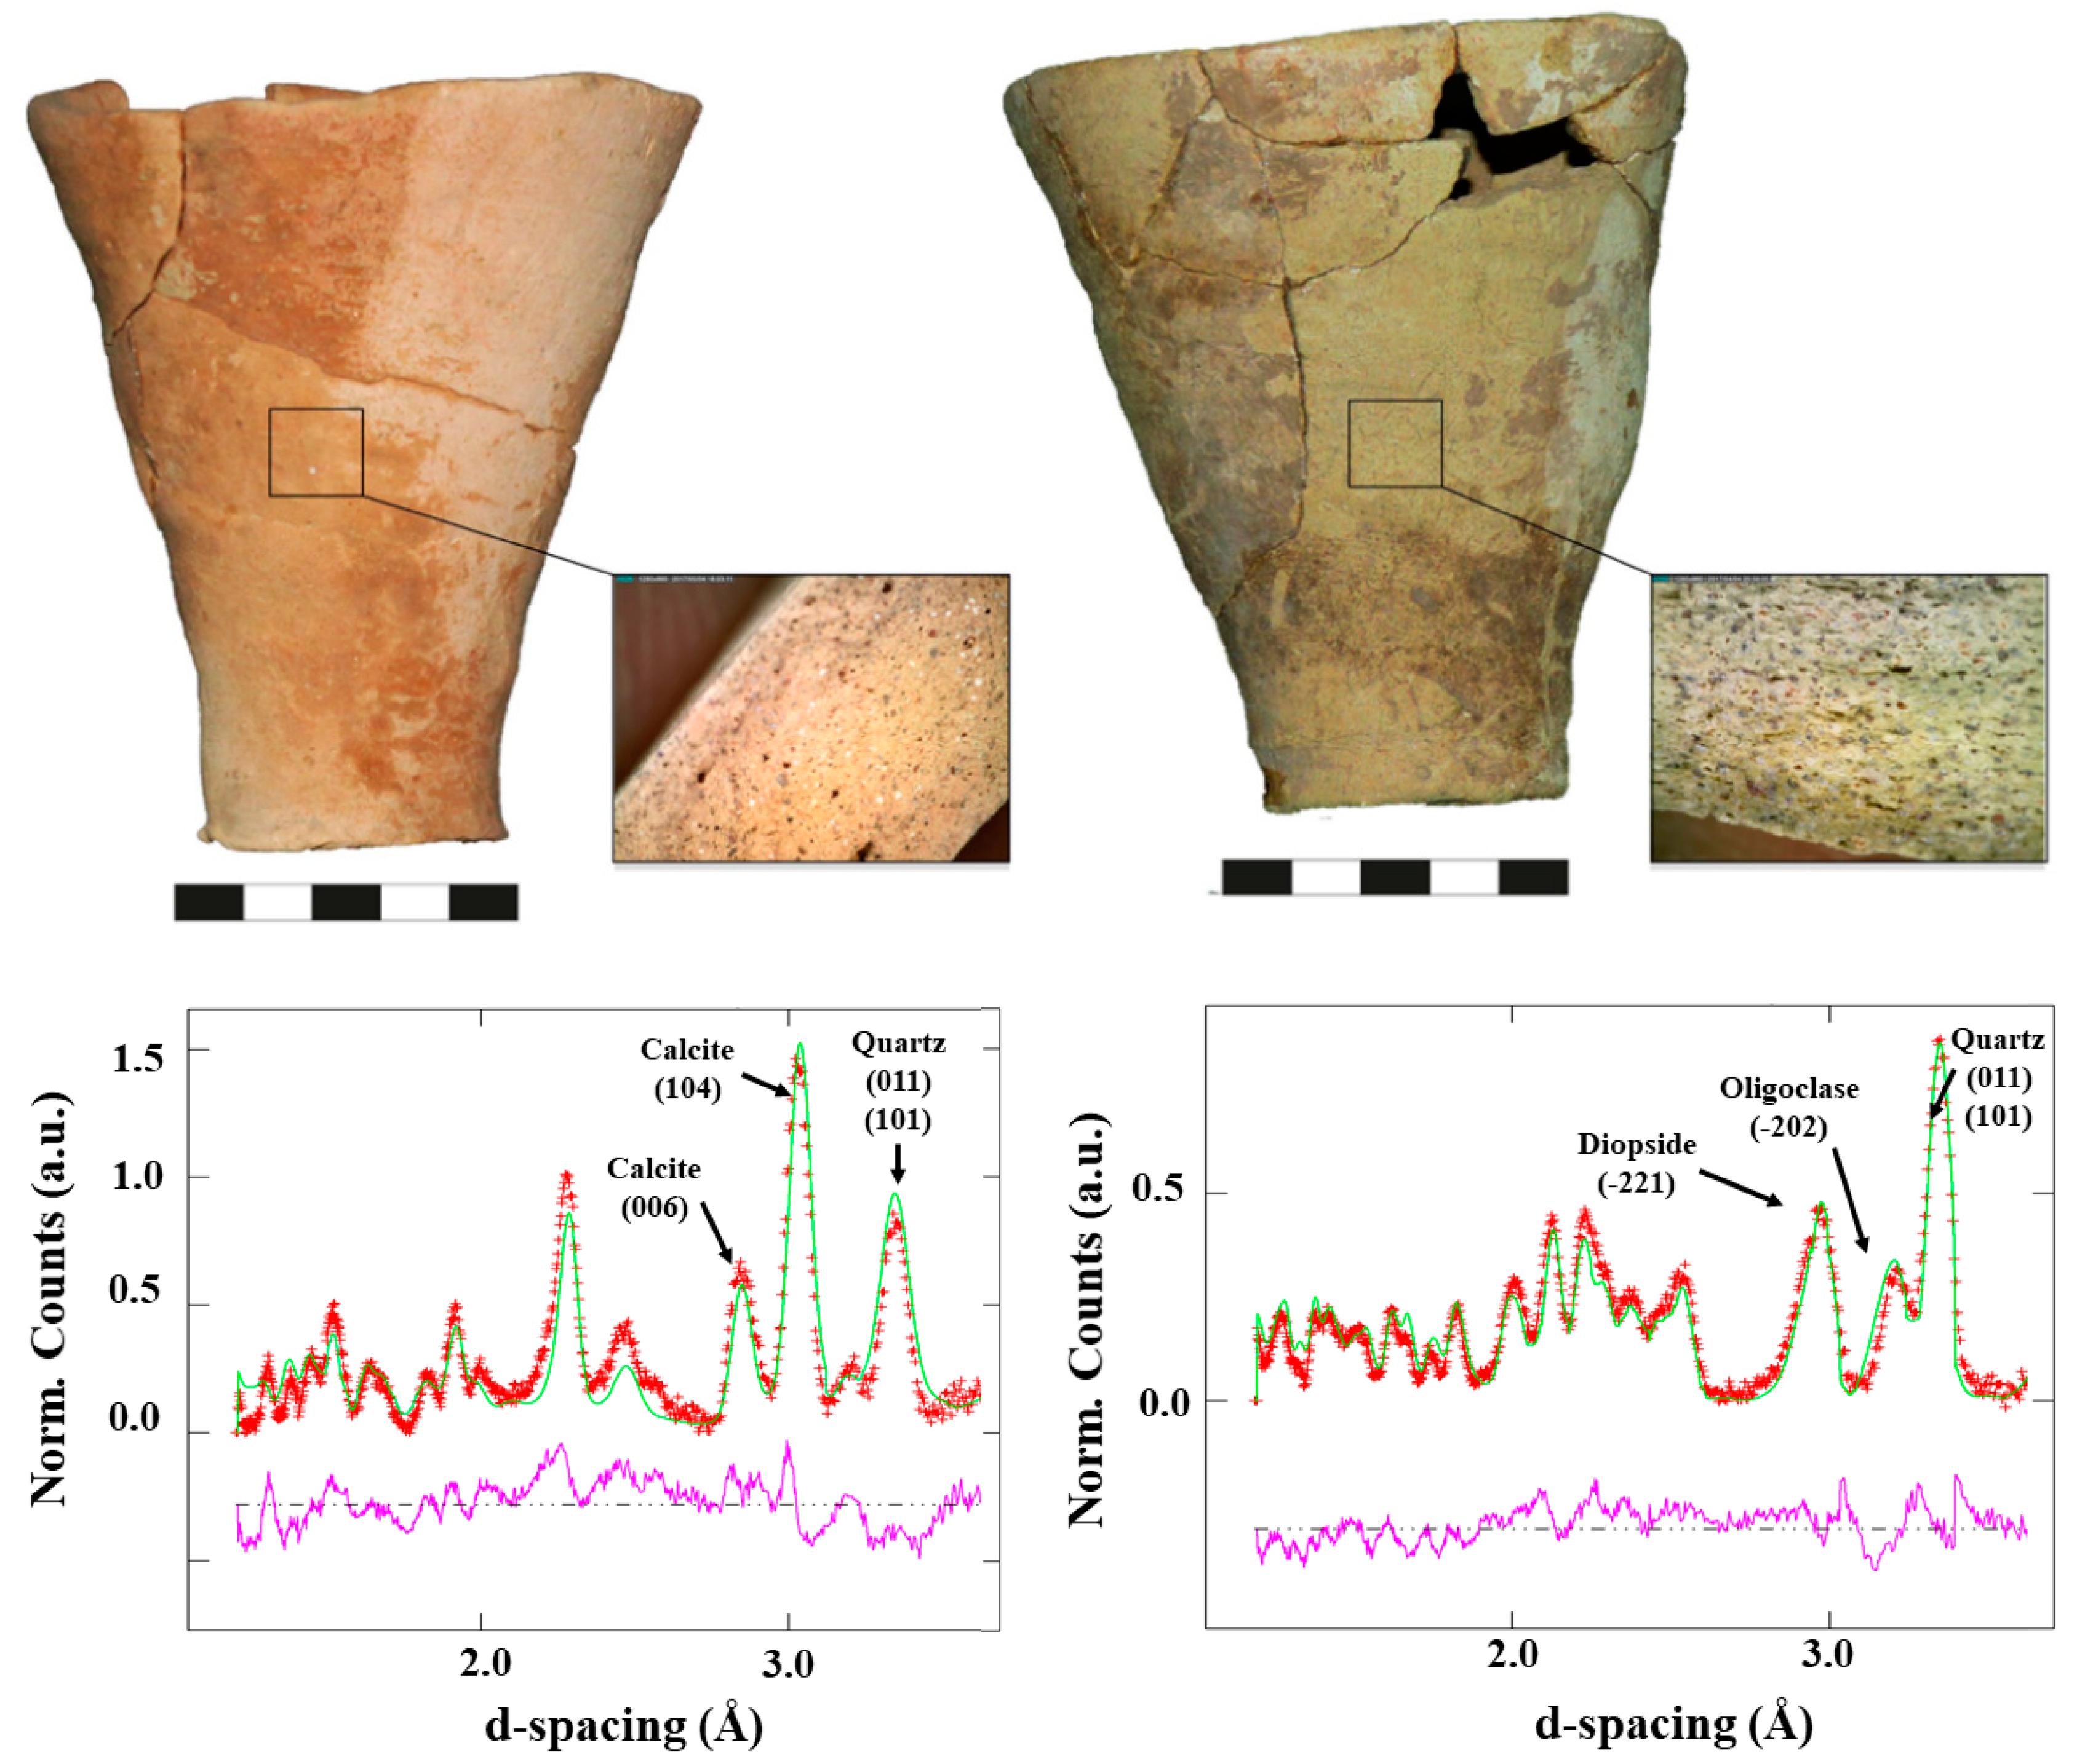 Geosciences | Free Full-Text | Sumerian Pottery Technology